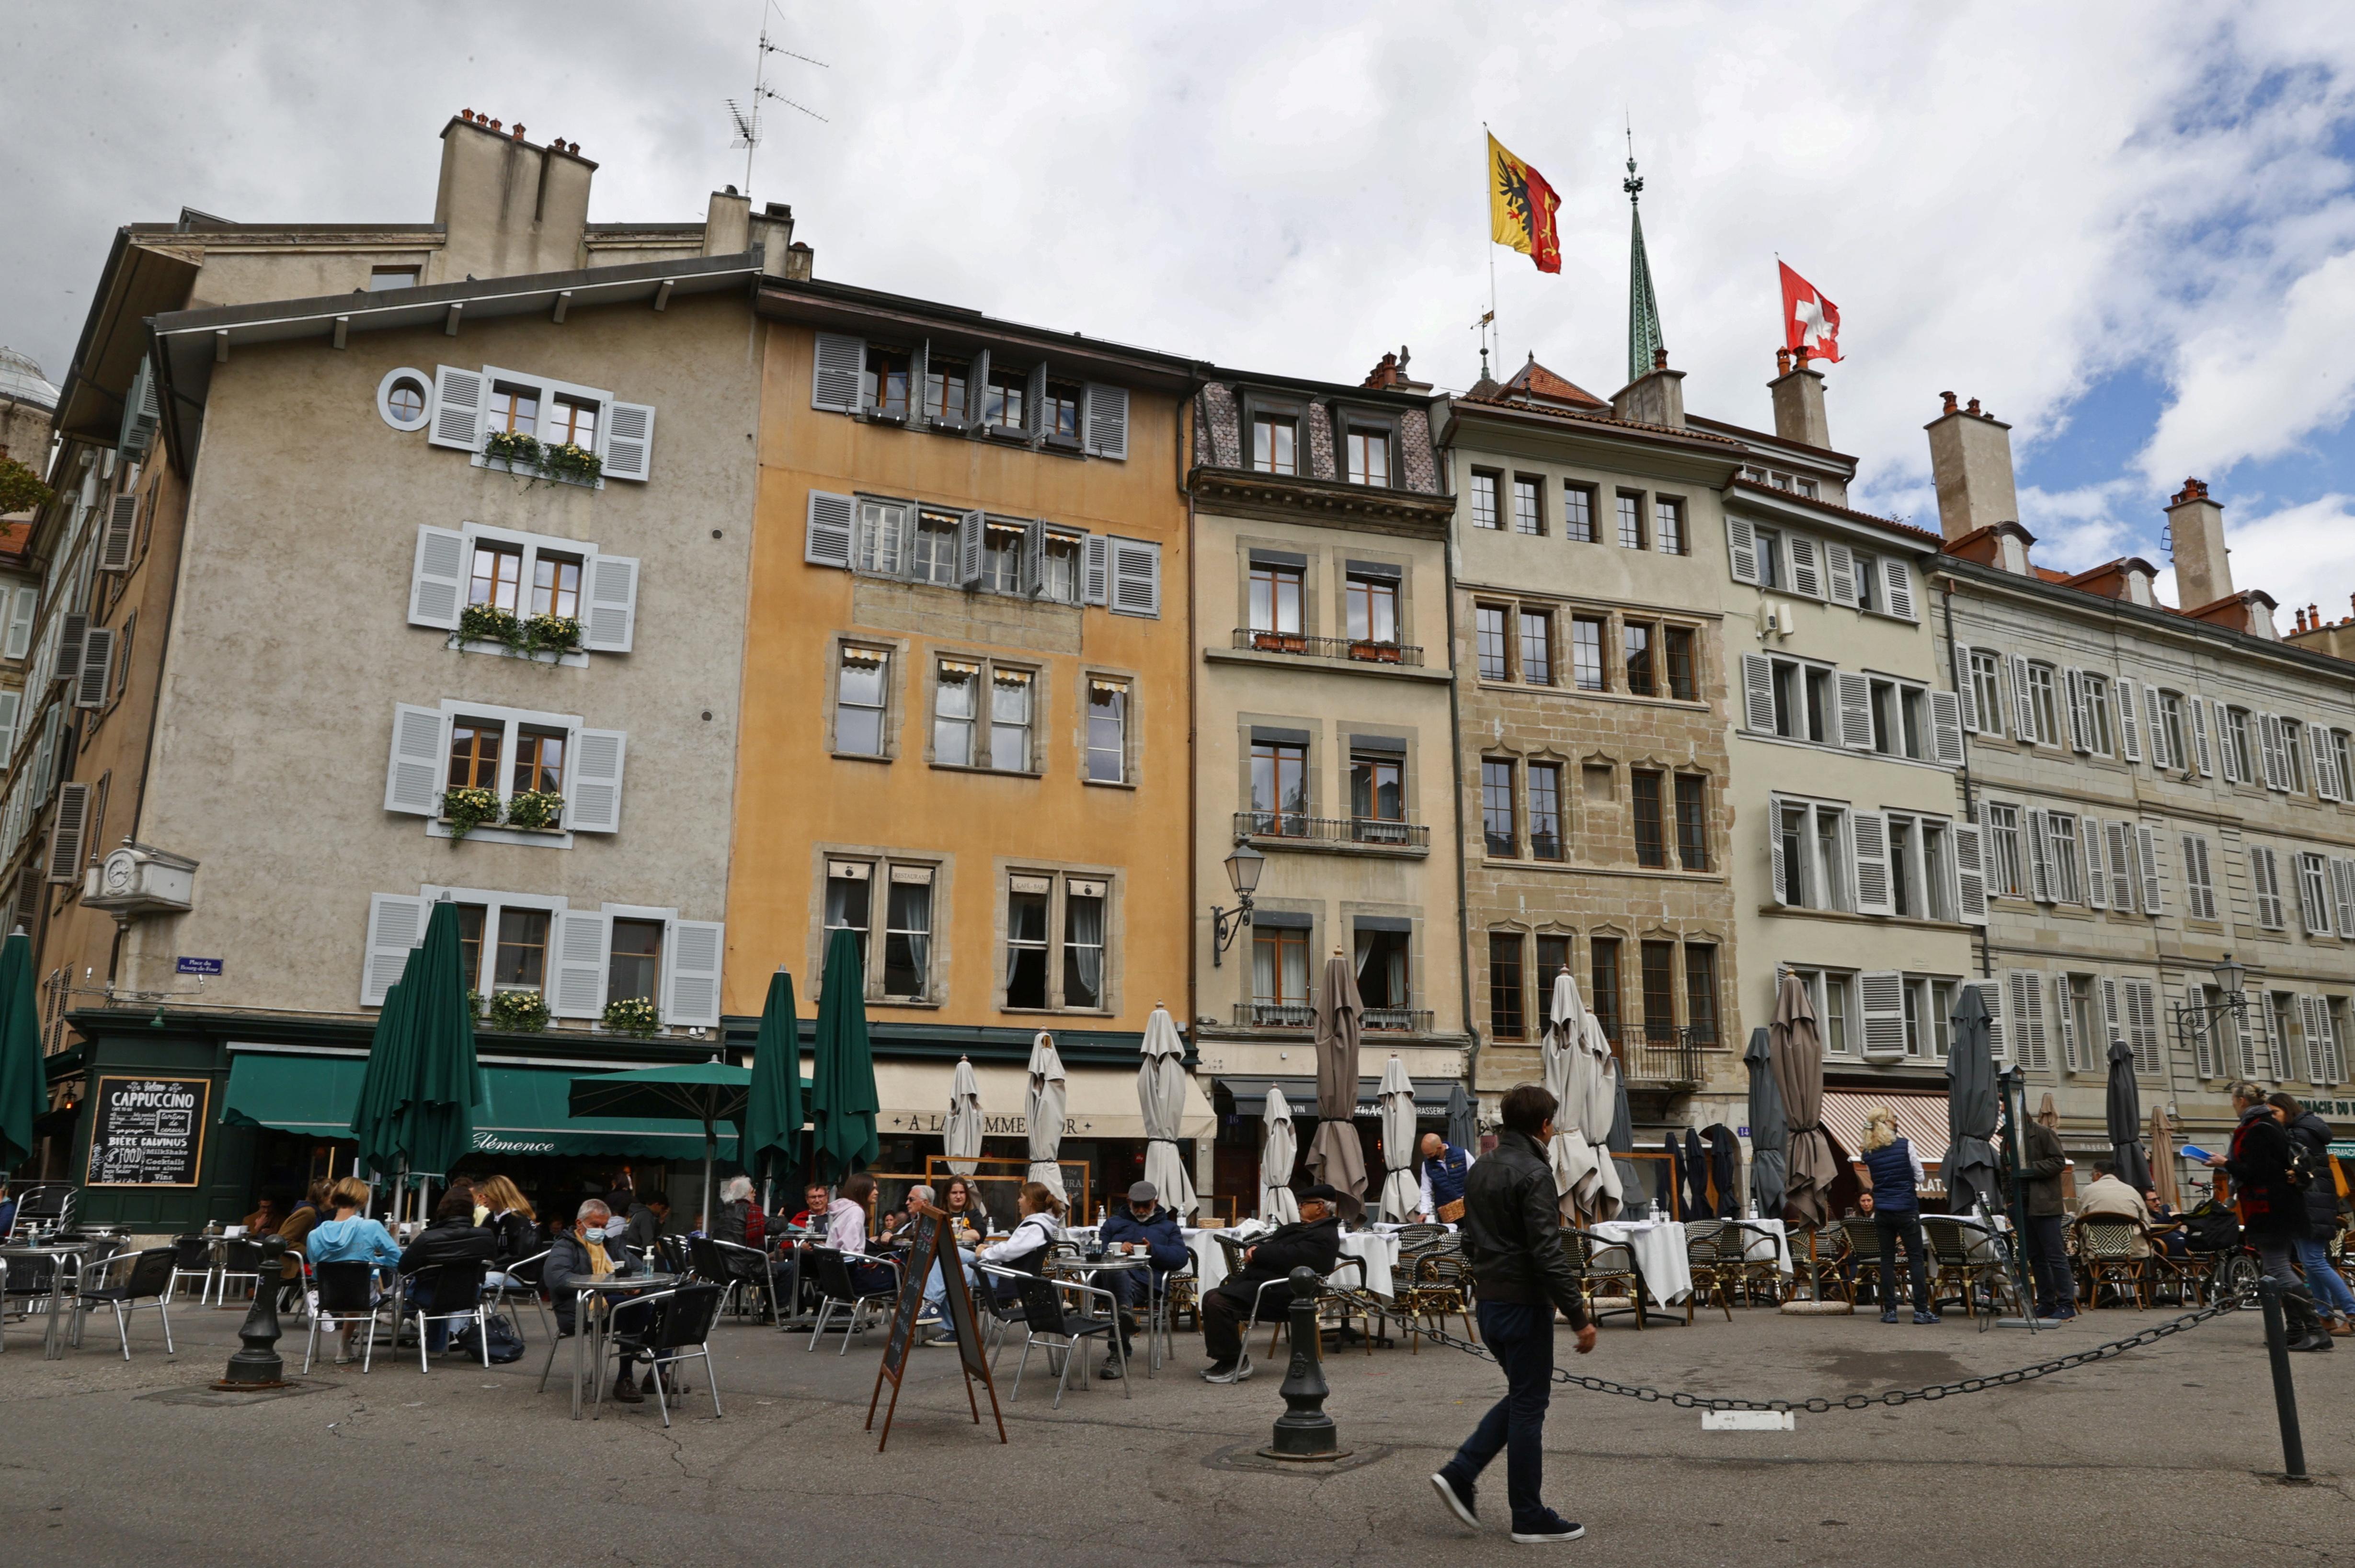 People eat on a terrace during easing of lockdown measures against the coronavirus disease (COVID-19) outbreak in Geneva, Switzerland, May 5, 2021. Picture taken May 5, 2021. REUTERS/Denis Balibouse